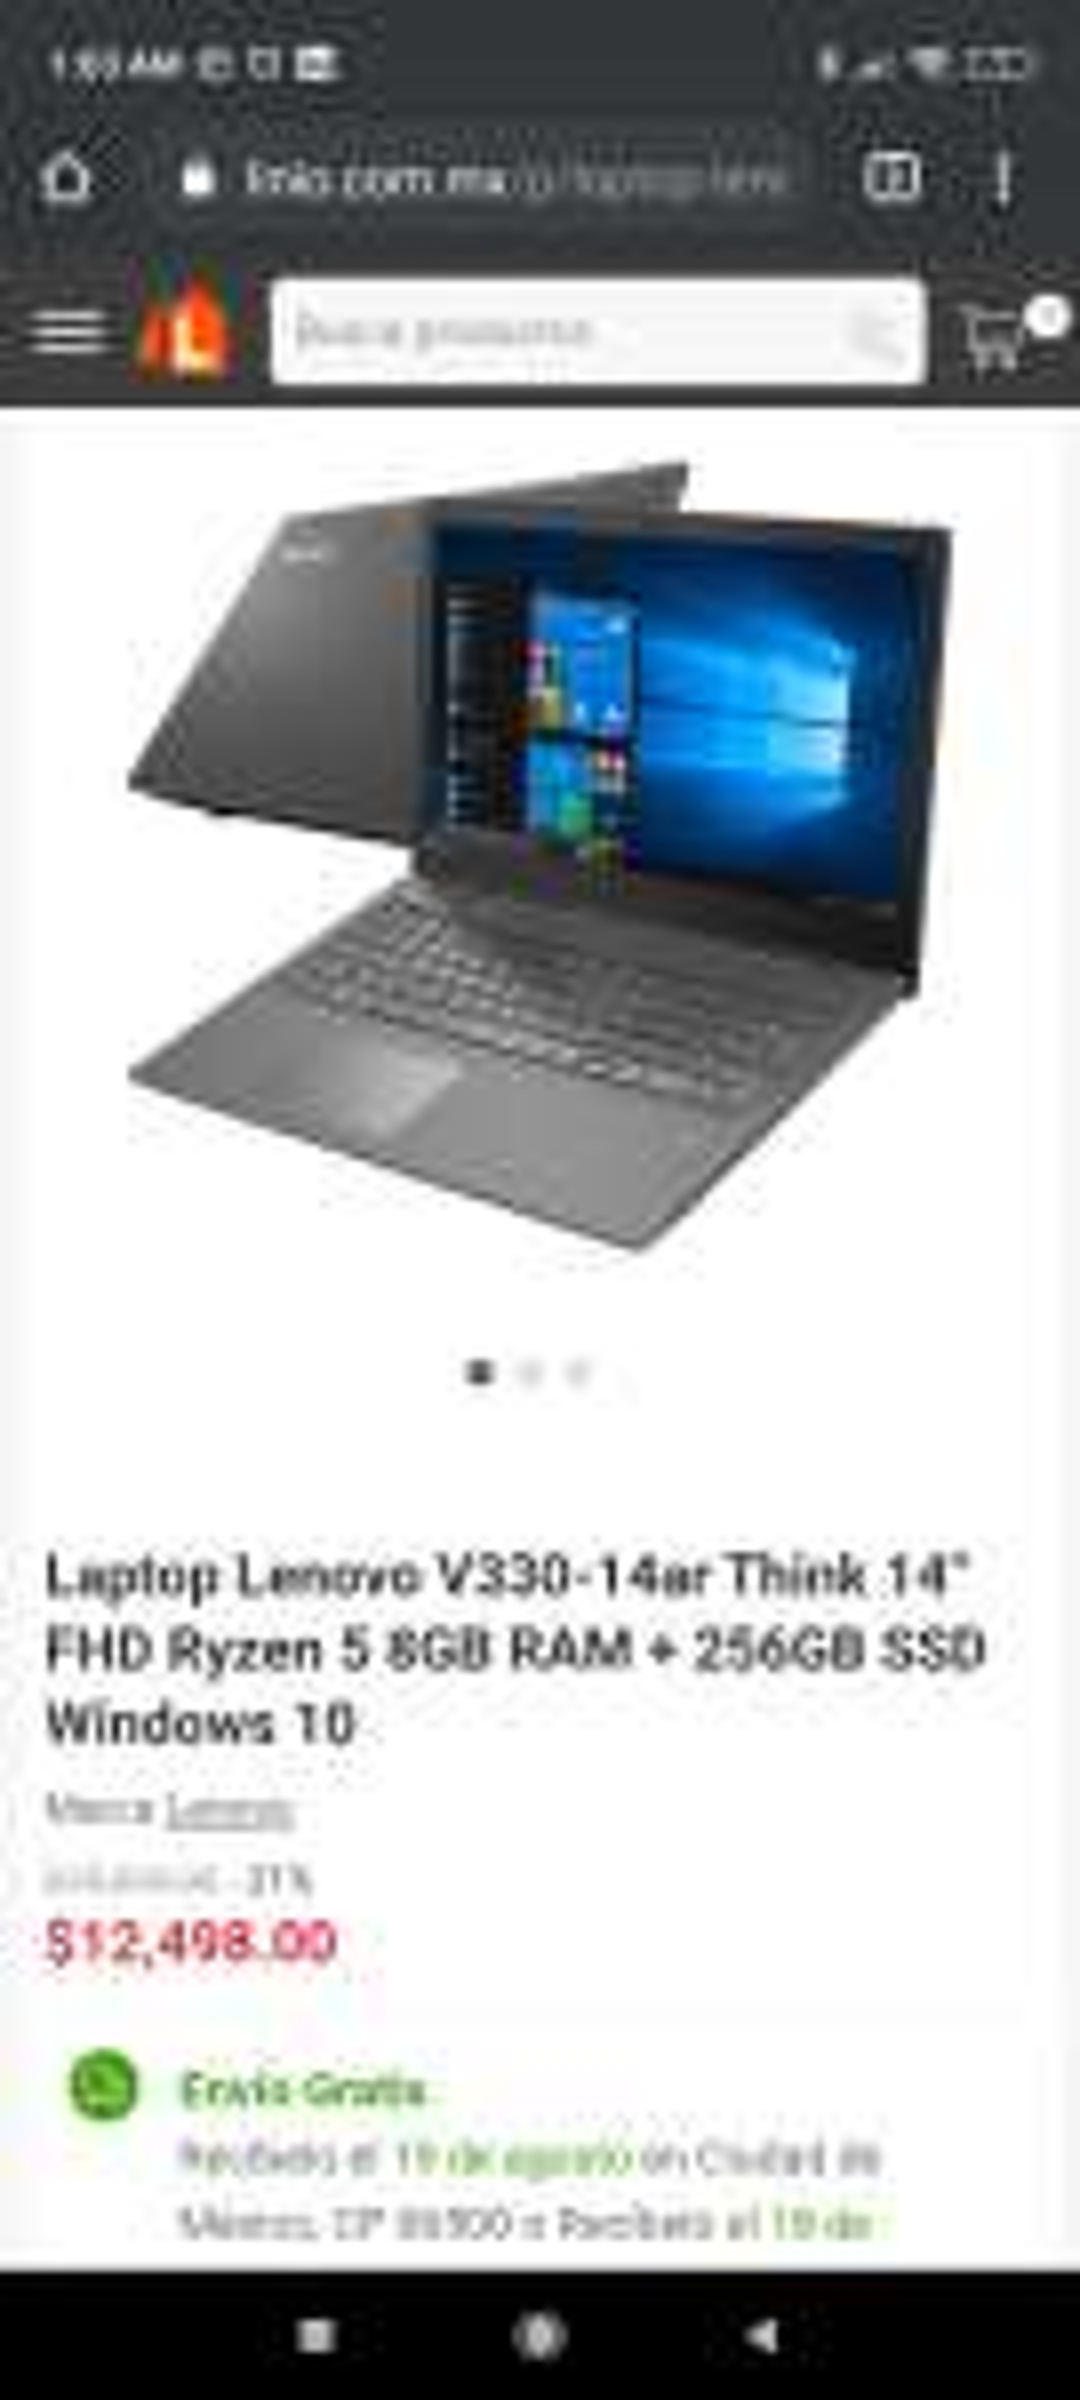 "Linio: Laptop Lenovo V330-14ar Think 14"" FHD Ryzen 5 8GB RAM + 256GB SSD Windows 10"